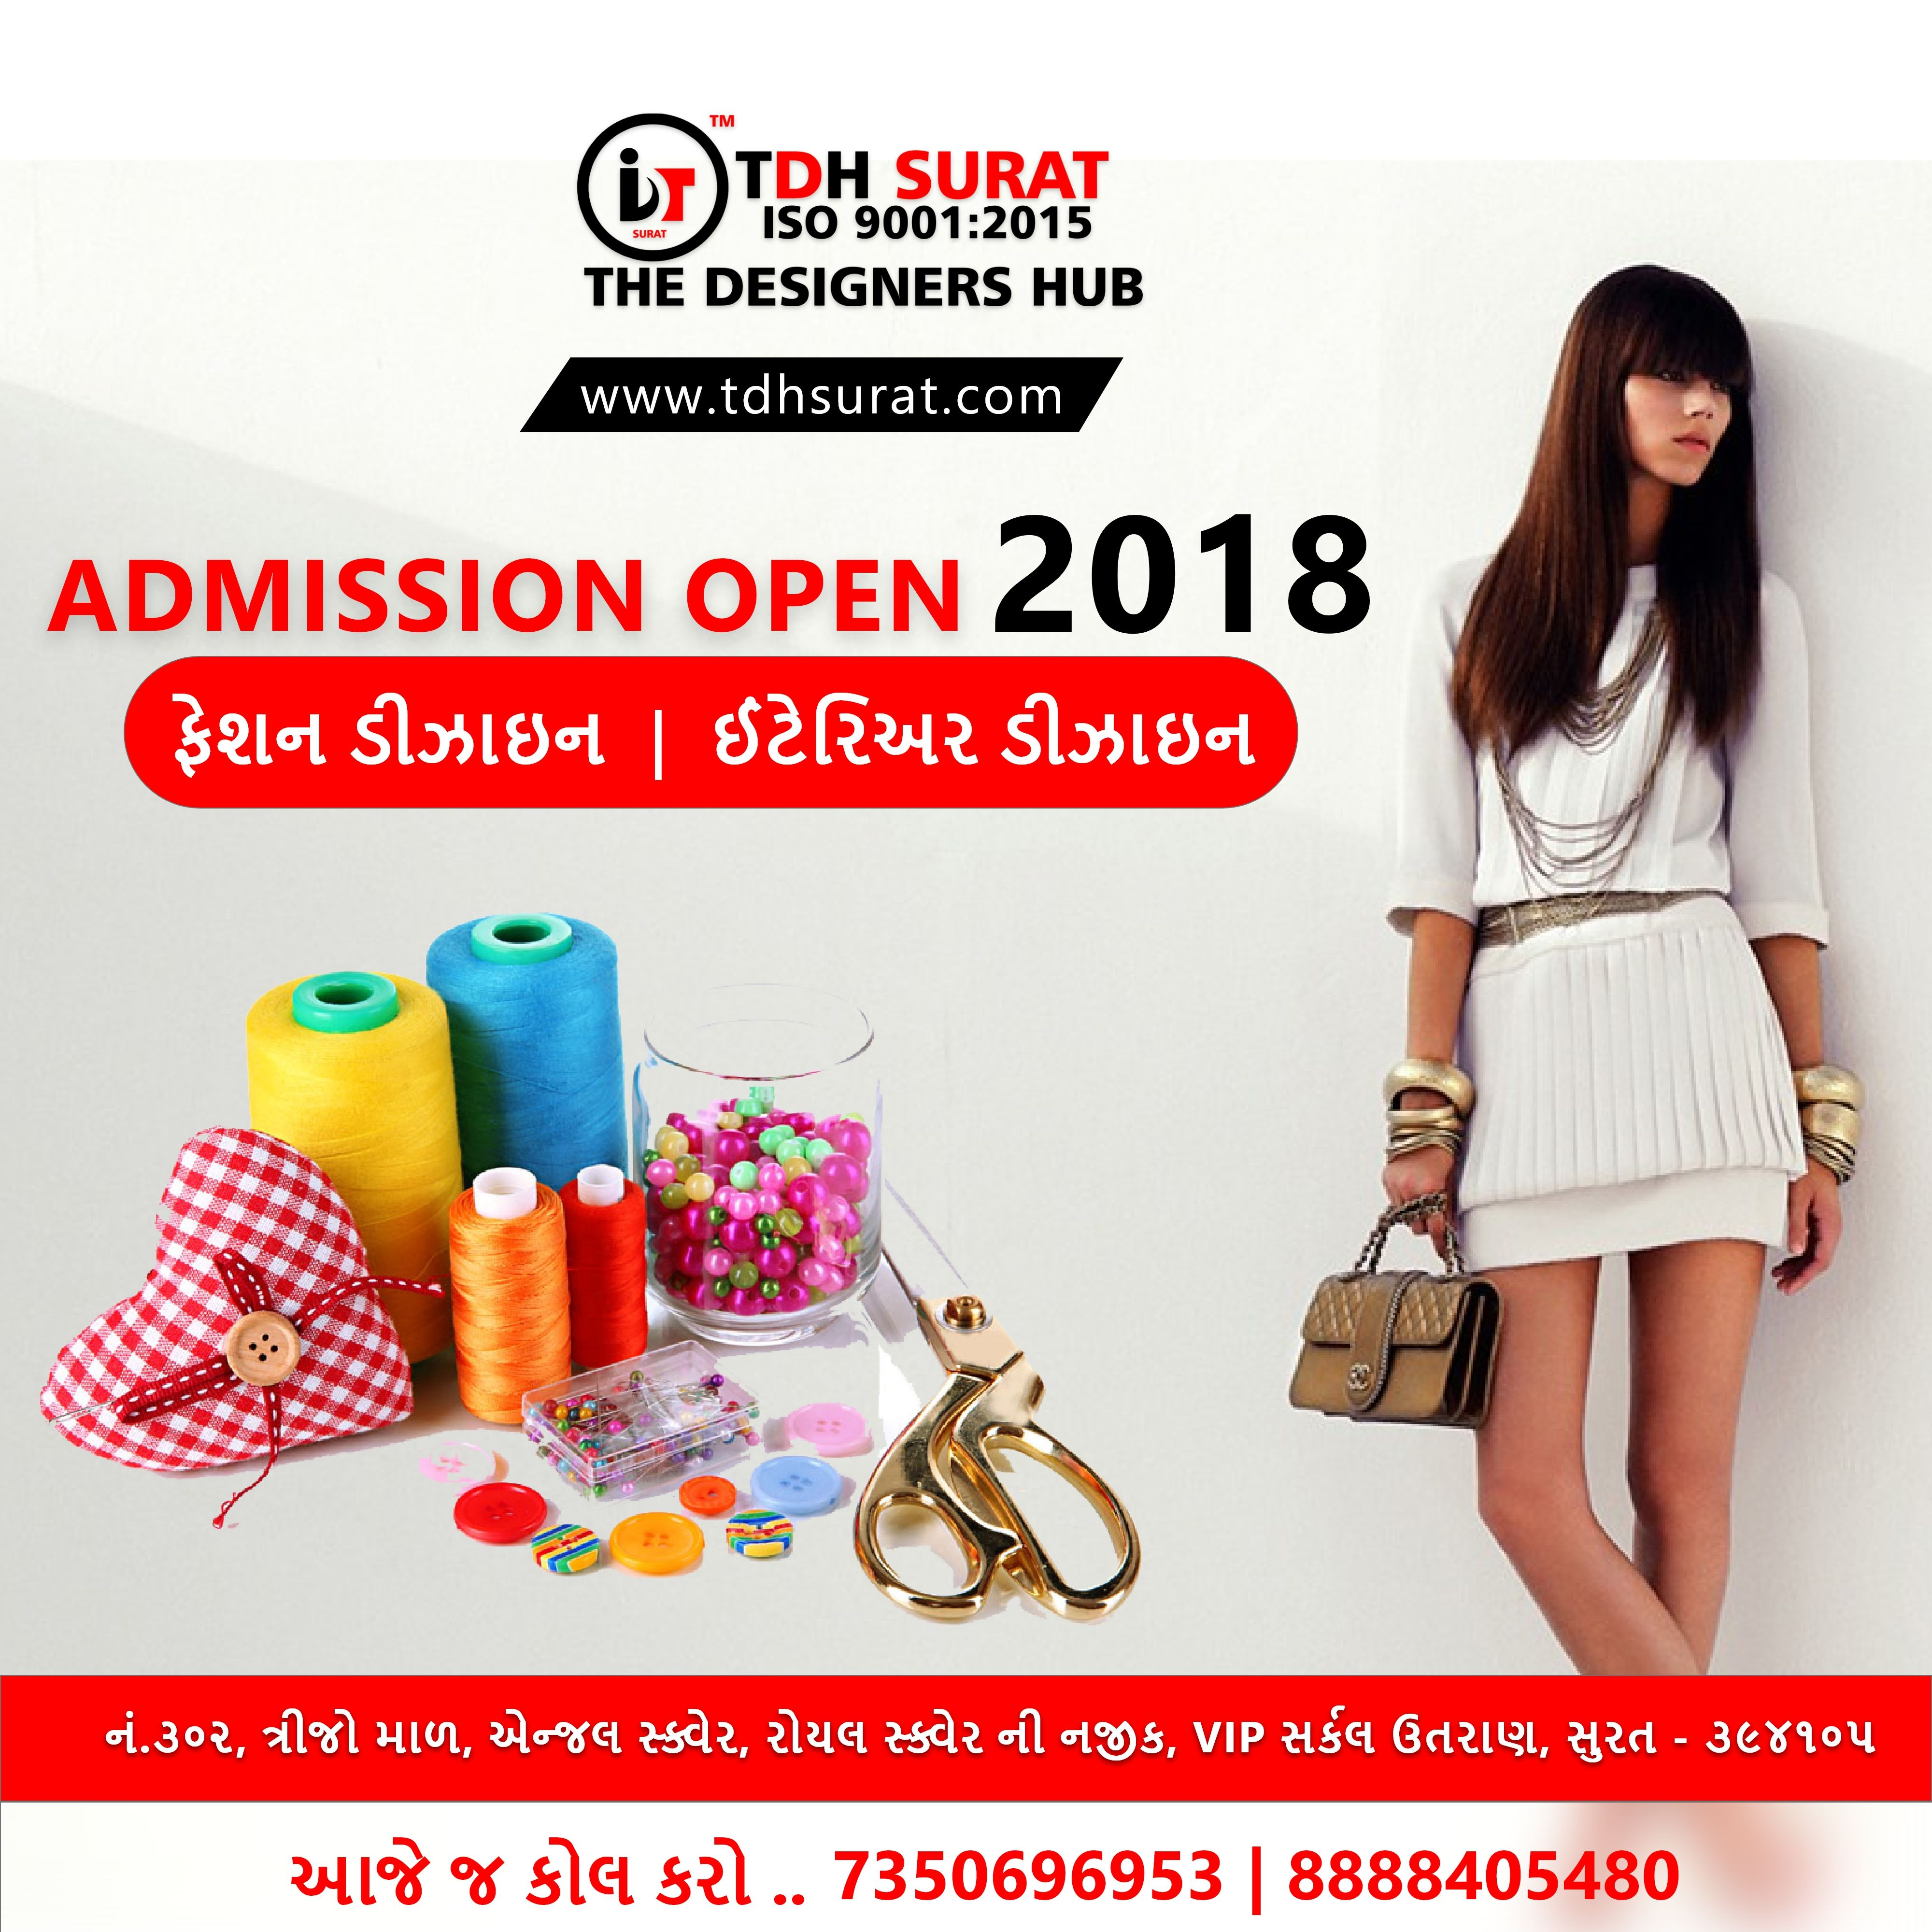 Admissions Open Fashion Designing Interior Designing Visit Www Tdhsurat Com Admissionopen Job Student Fashion Fashio Design Fashion Design Admissions